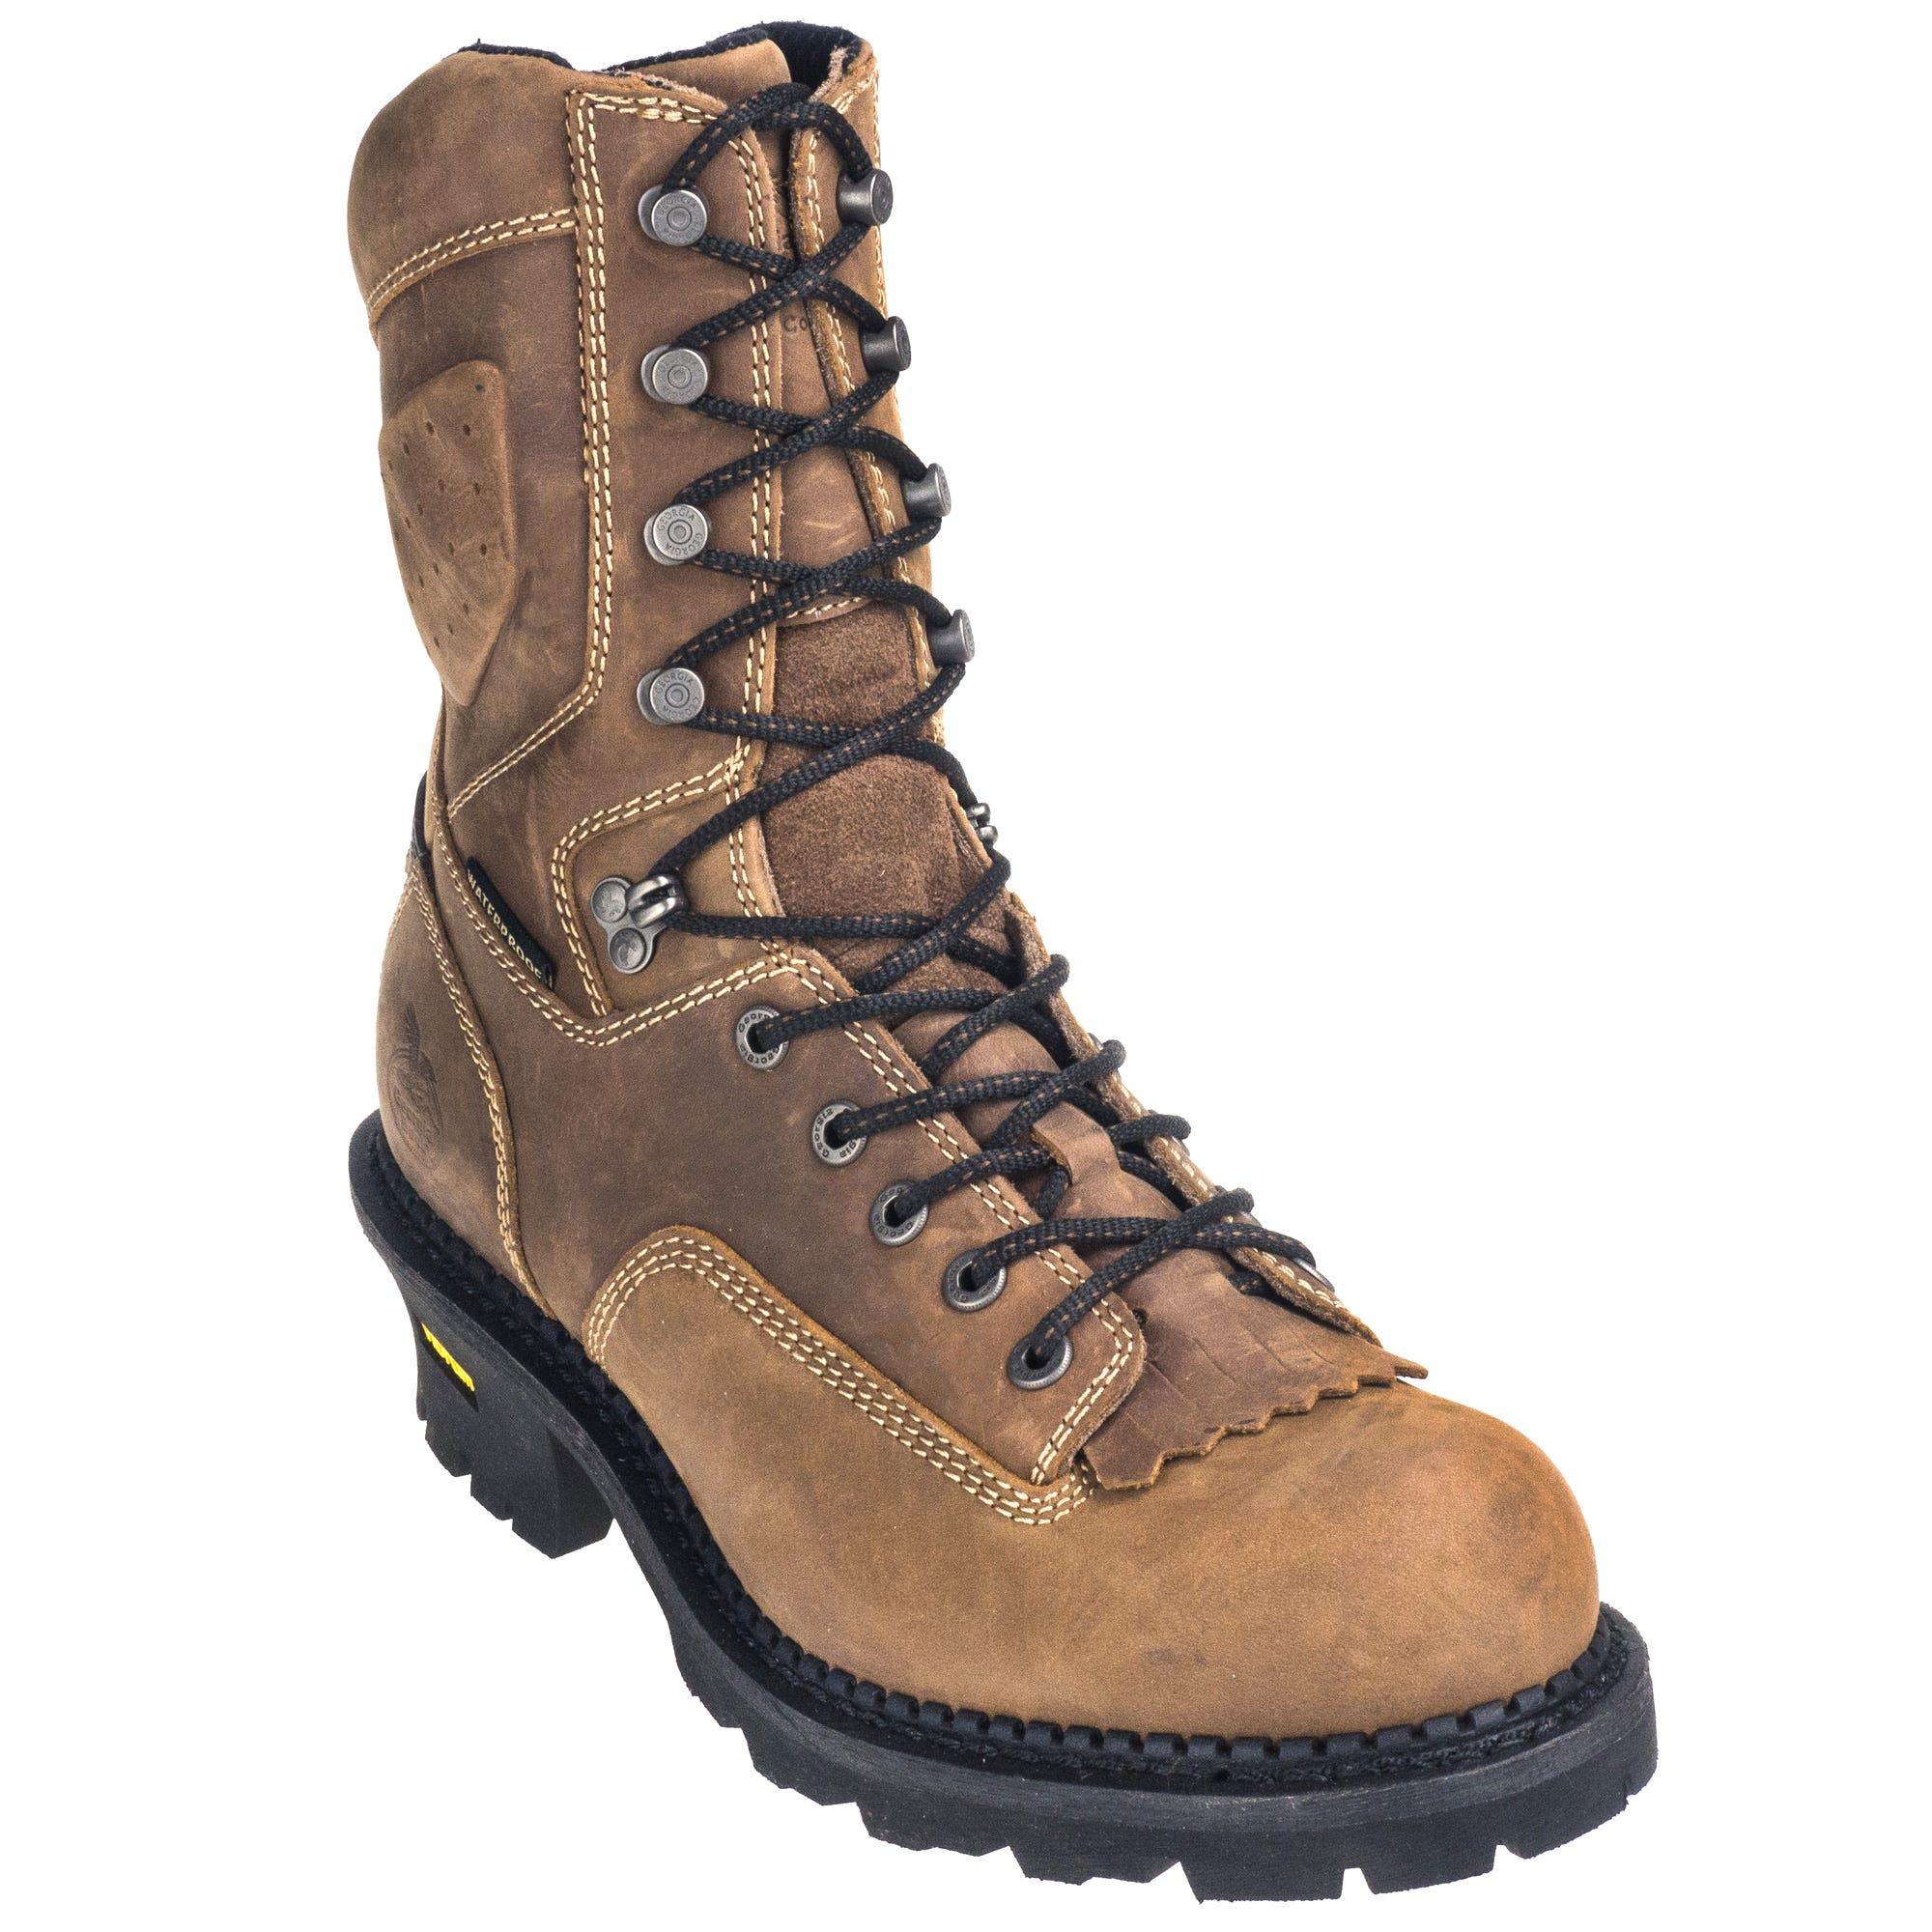 44592aeac2b Georgia Men's Boots   MenStyle USA